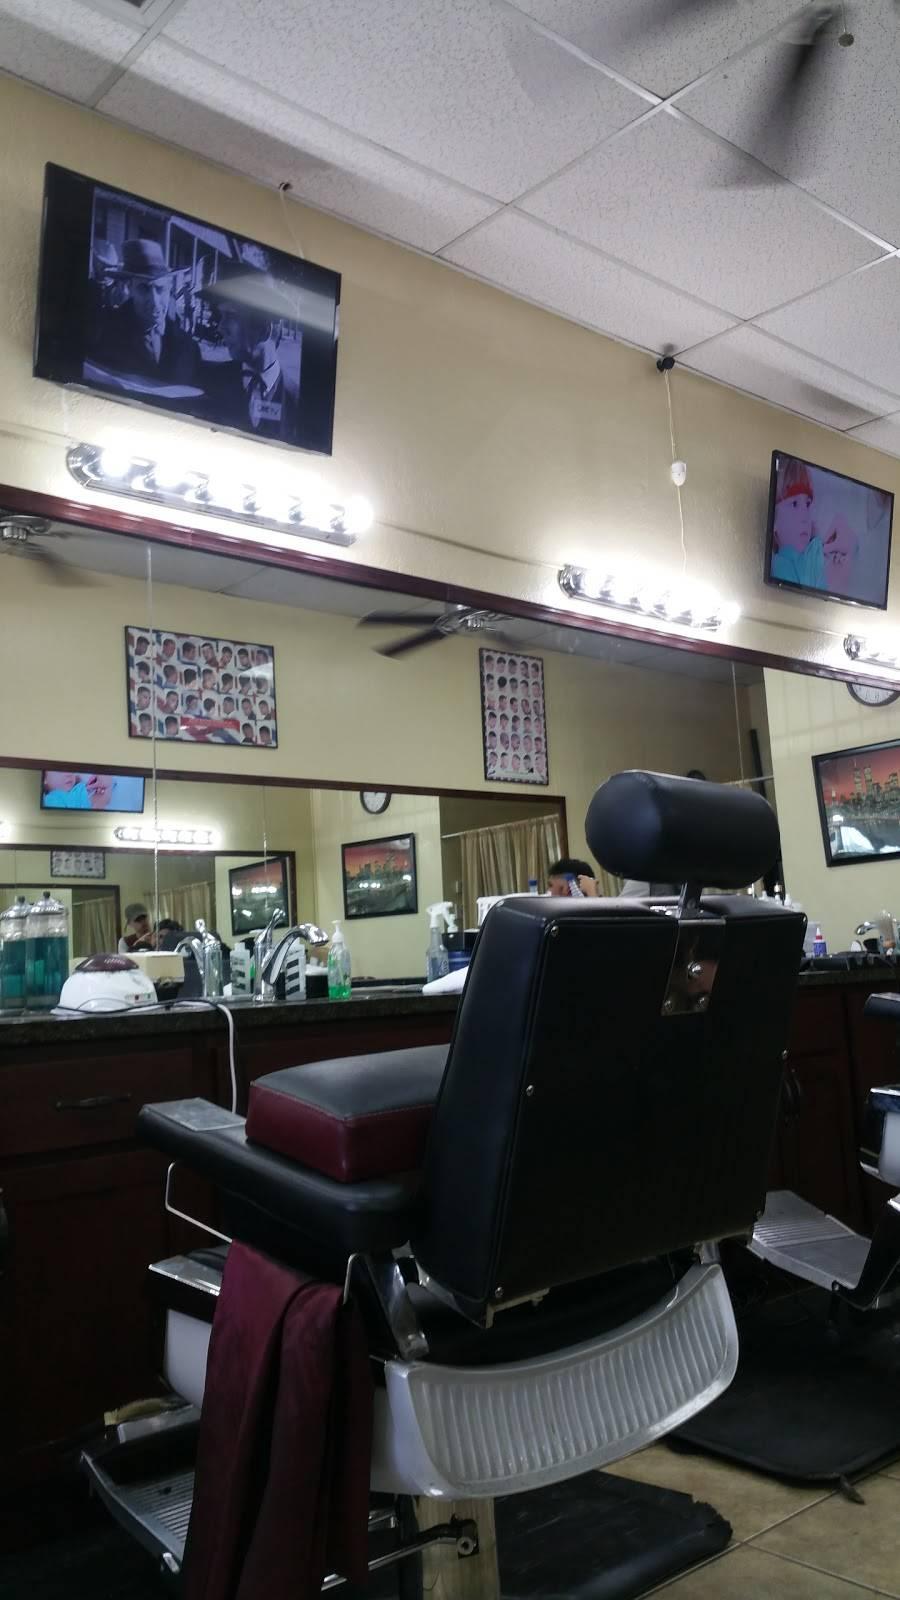 Ayads Barber Shop - hair care  | Photo 2 of 6 | Address: 4818 N 27th Ave, Phoenix, AZ 85017, USA | Phone: (602) 633-3980